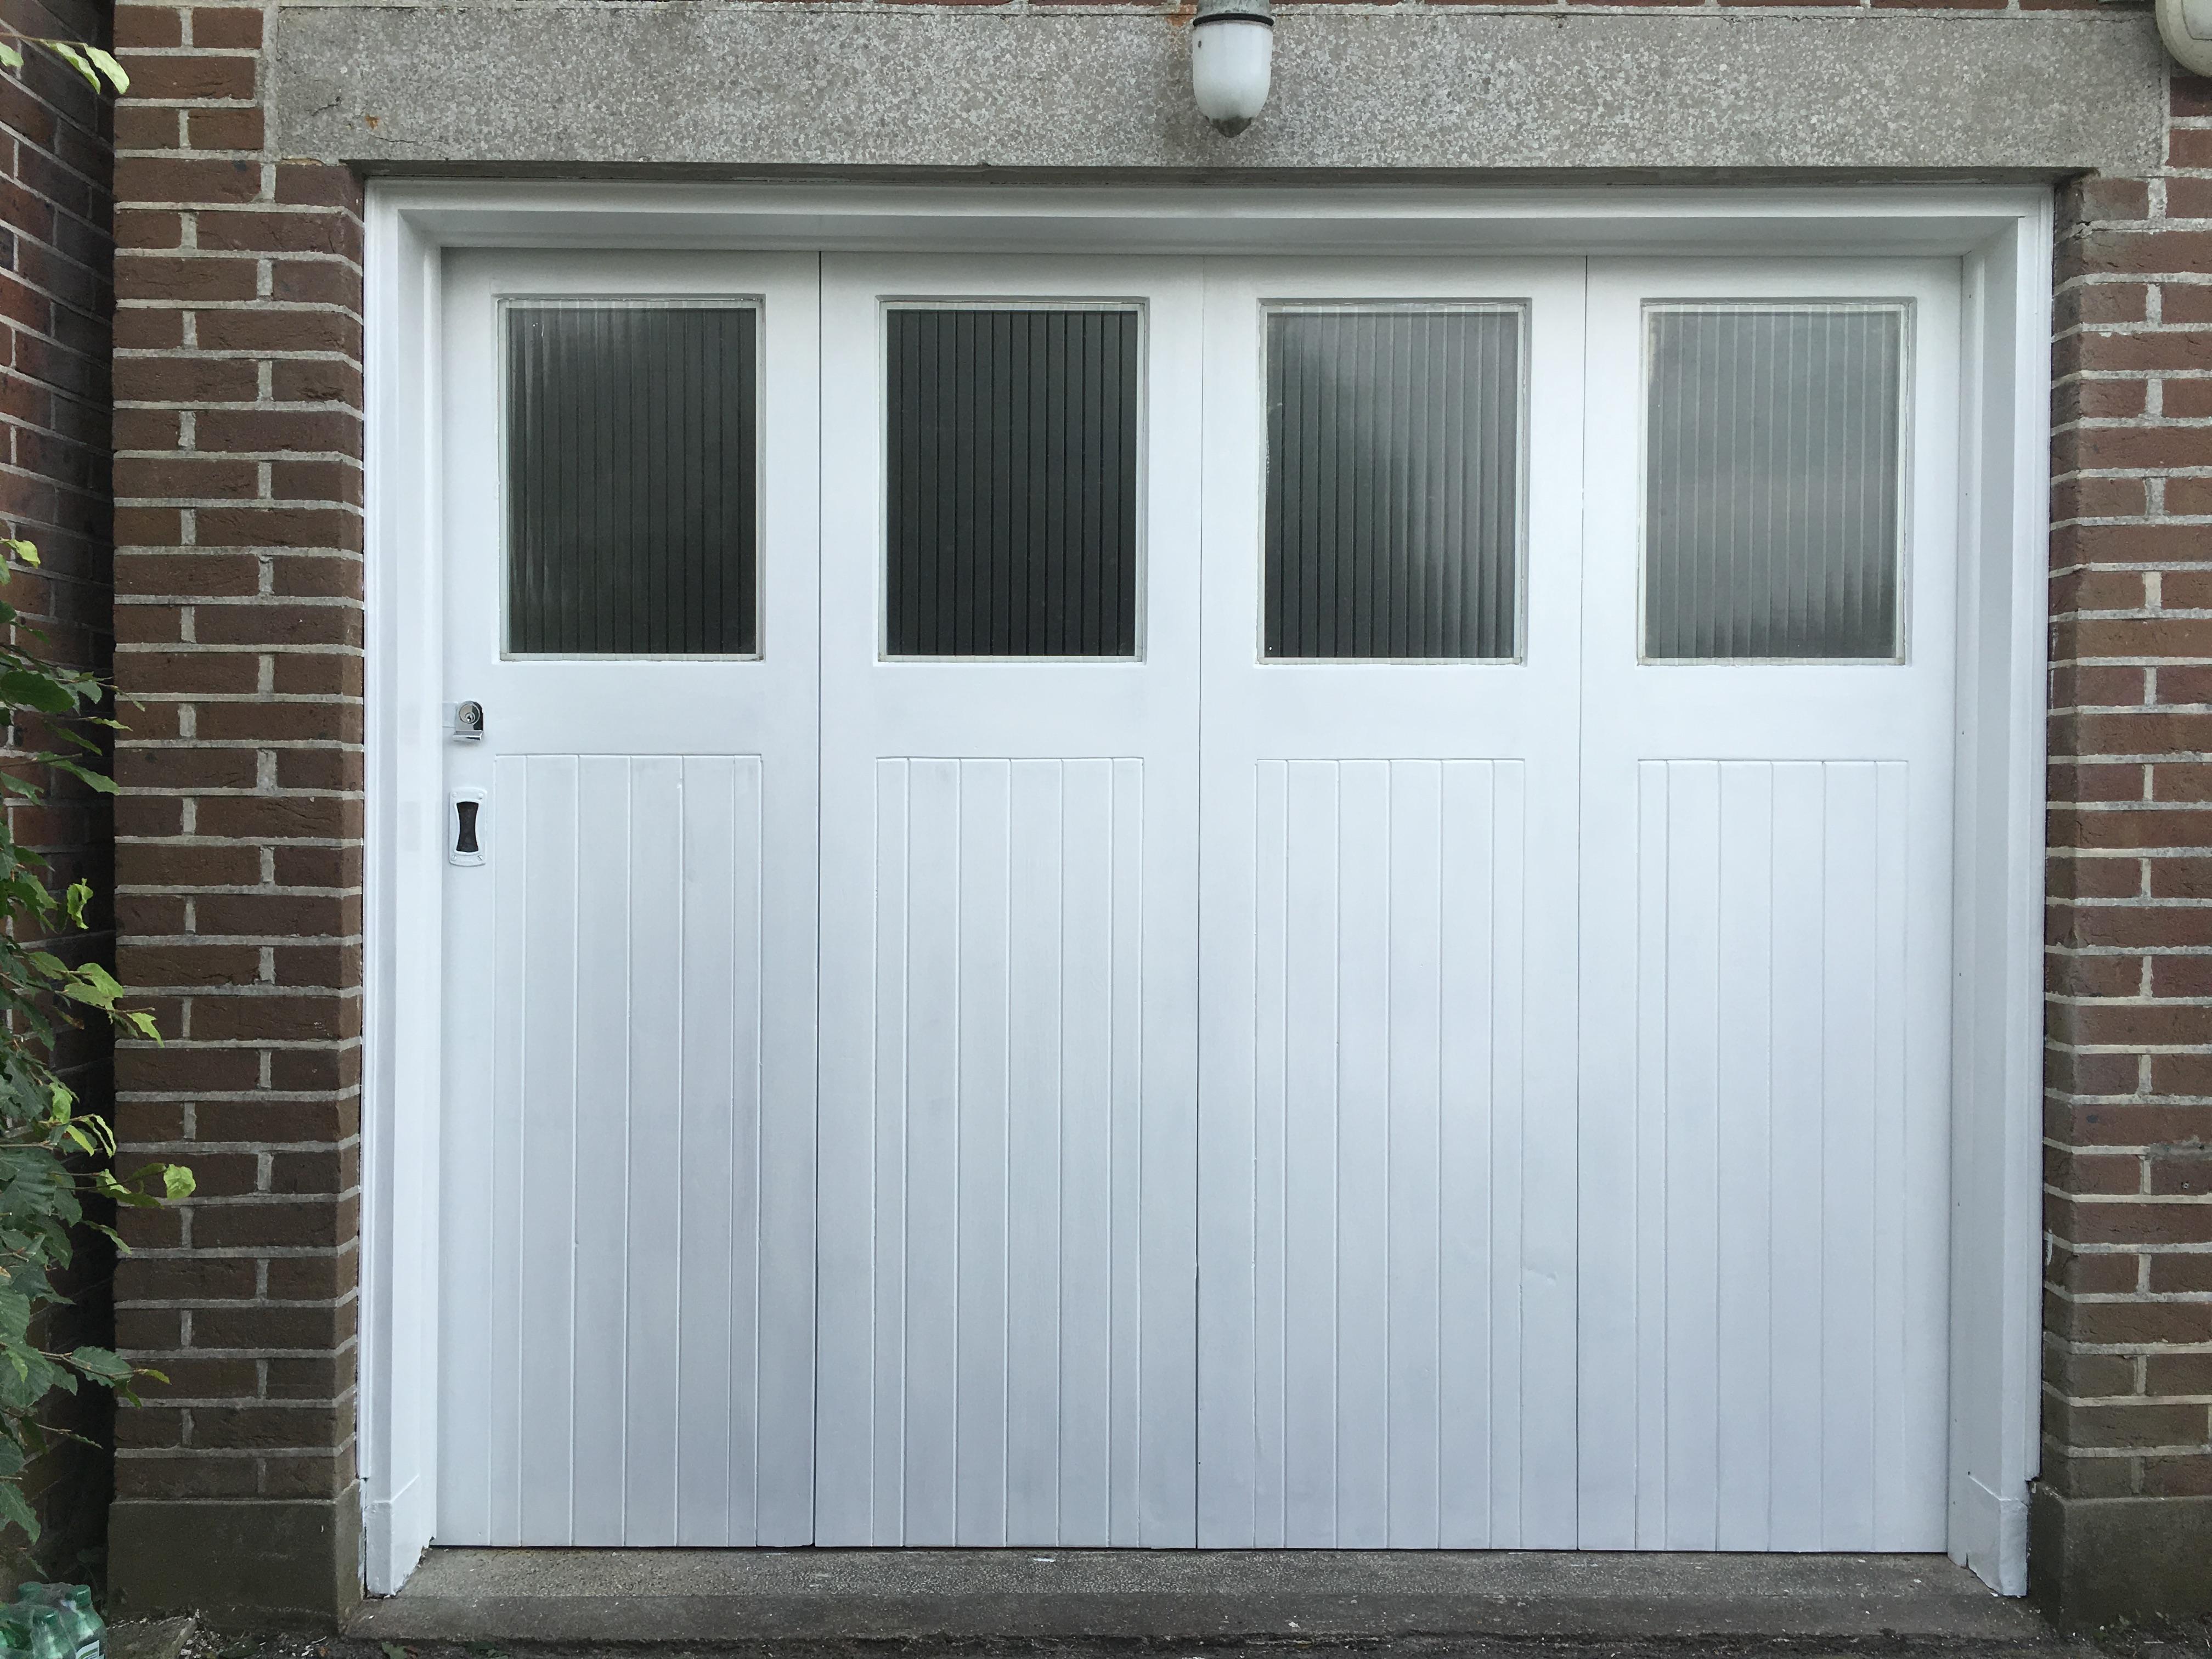 Restored bi-fold garage doors